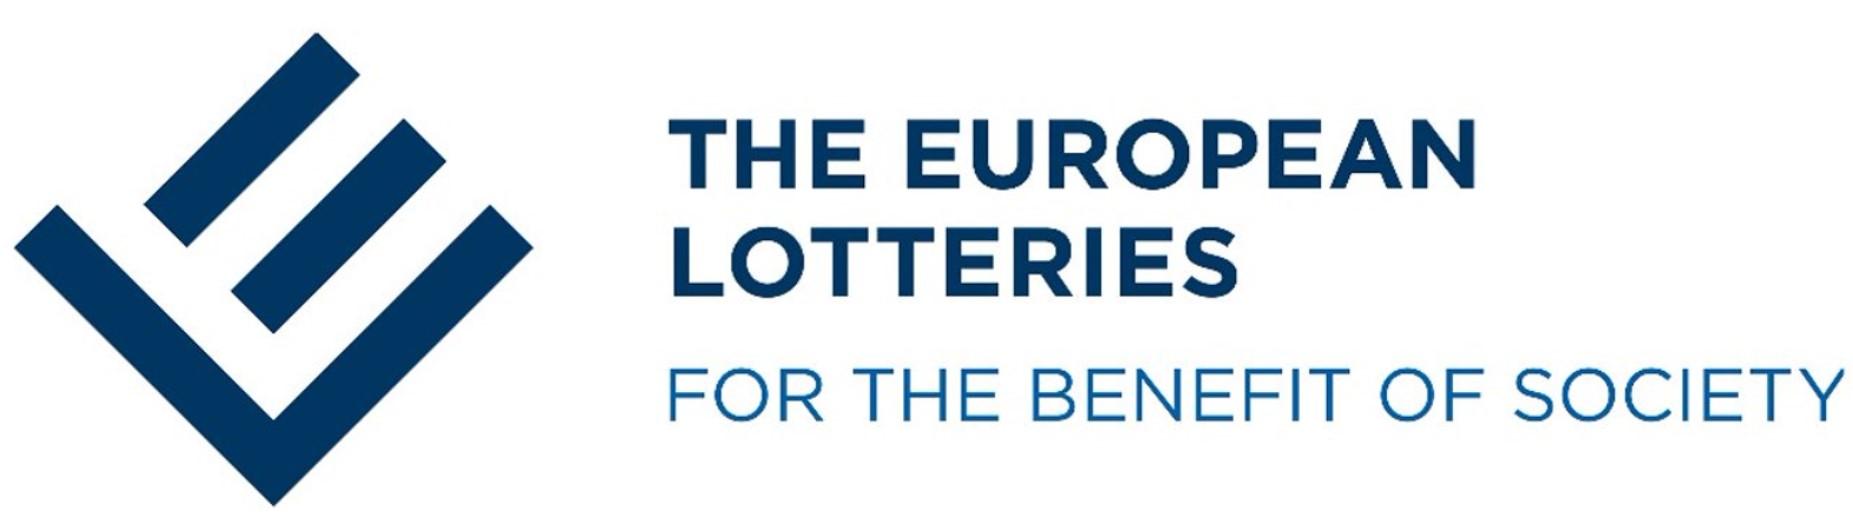 European Lotteries Association